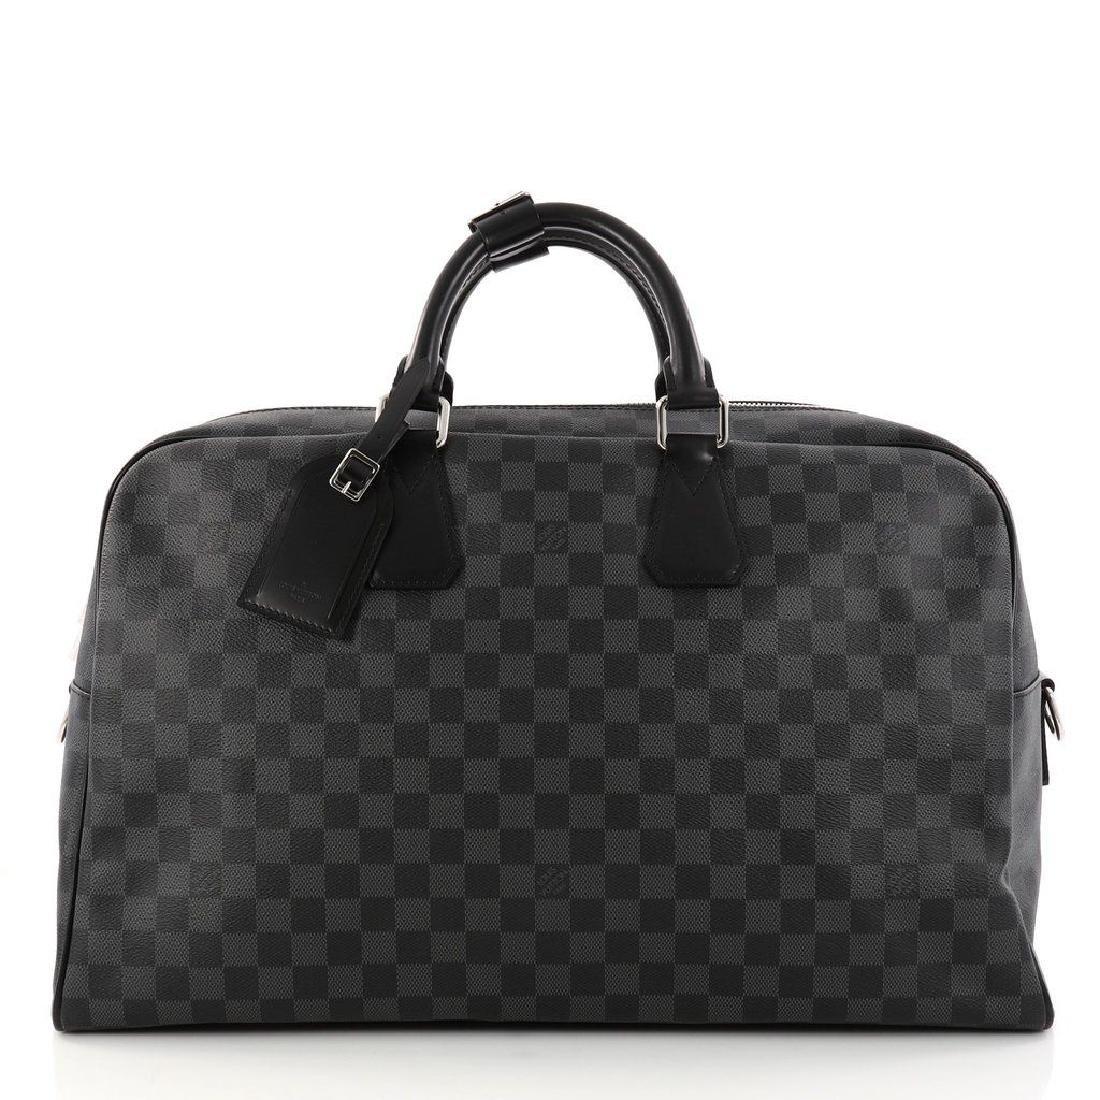 Louis Vuitton Neo Kendall Damier Graphite Duffle - 3